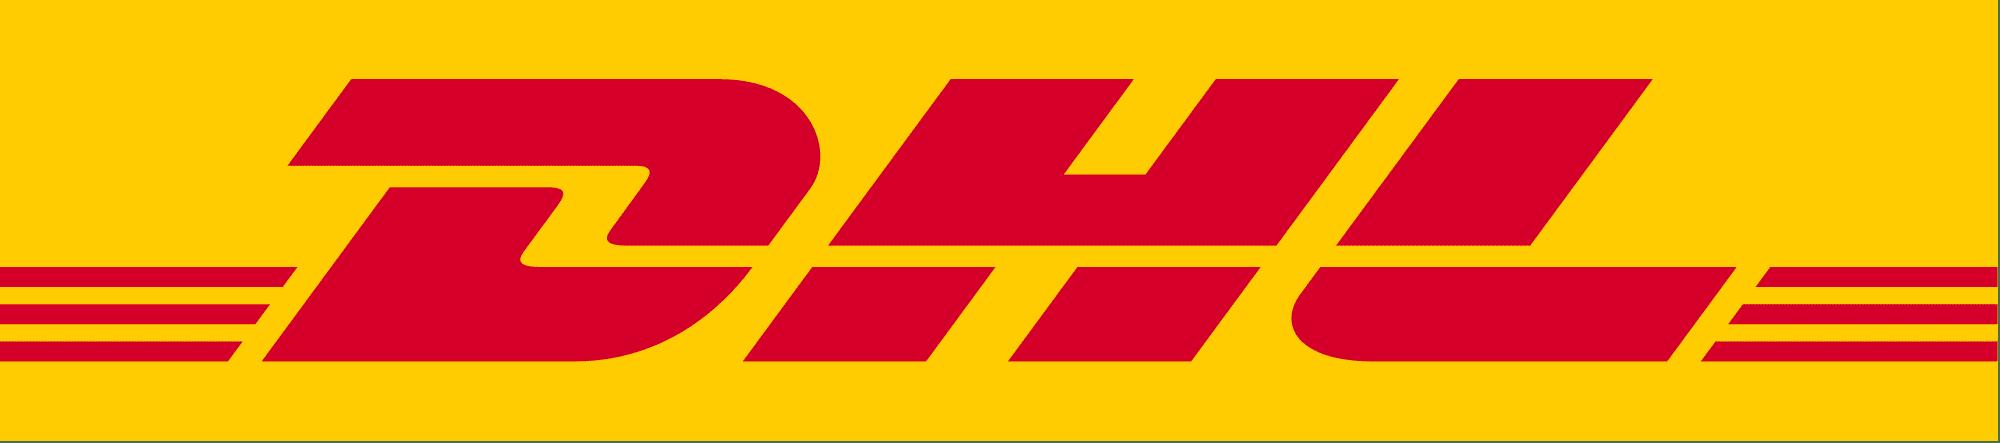 DHL logo color